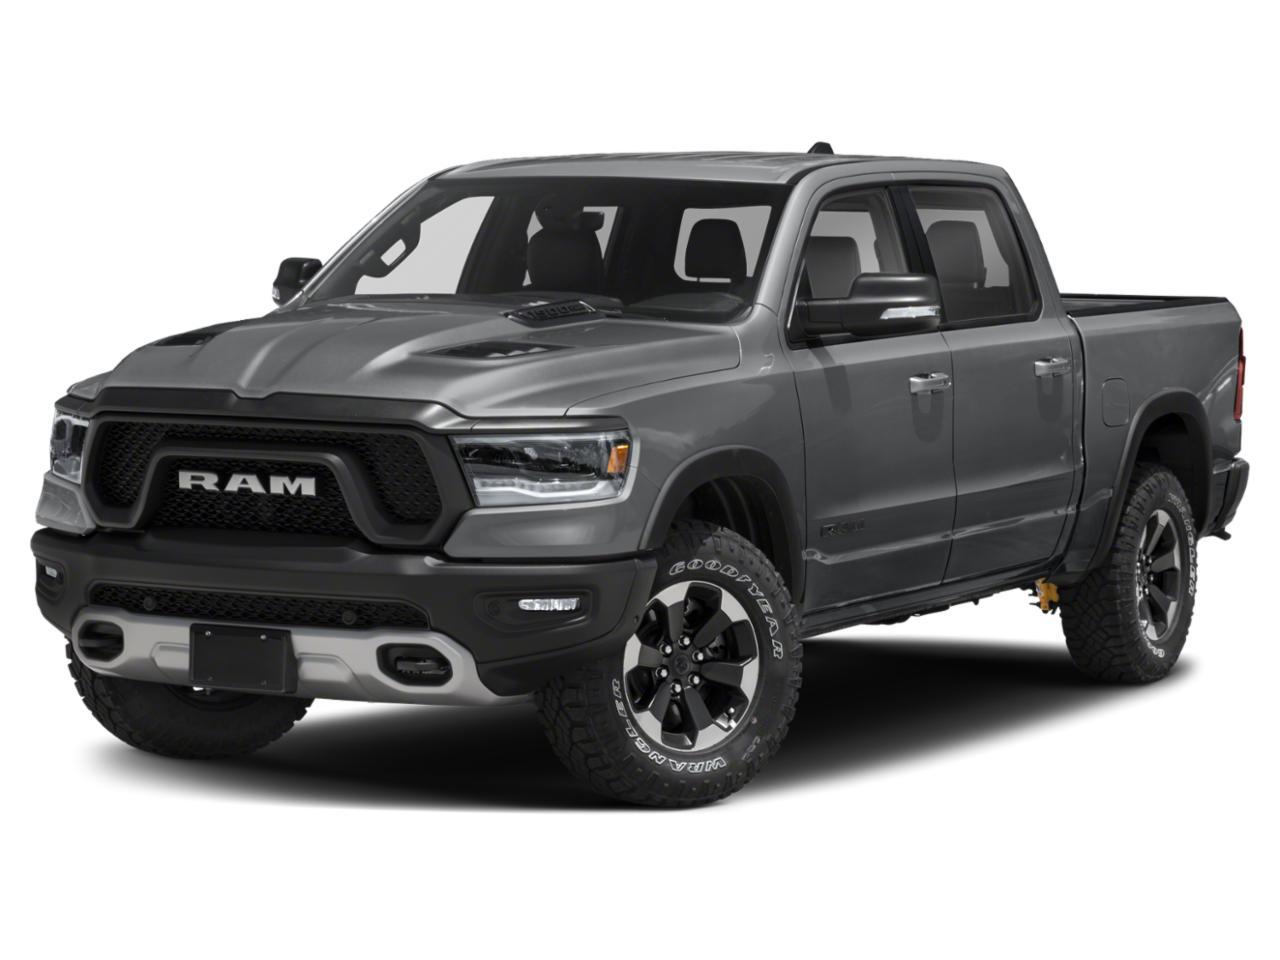 2019 Ram 1500 Vehicle Photo in Nashua, NH 03060